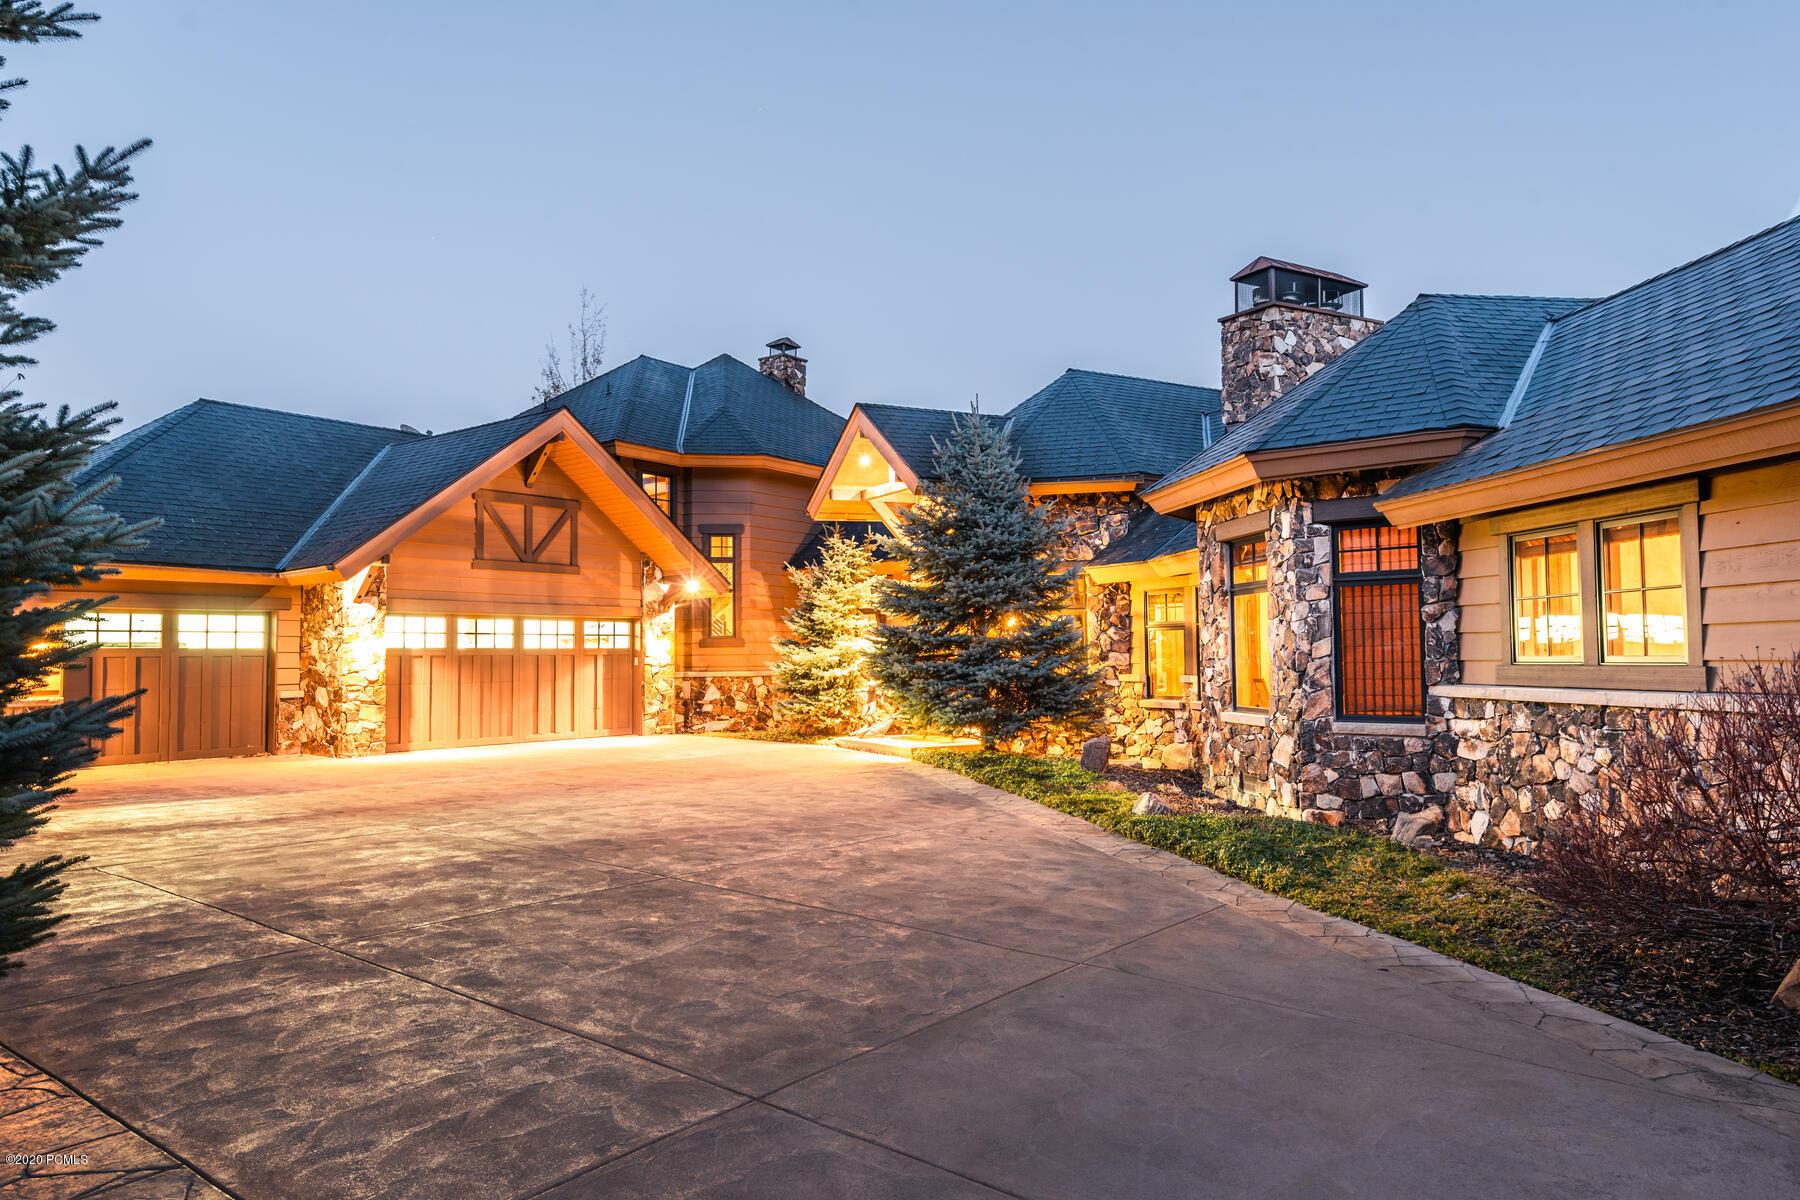 2998 Deer Crest Estates Drive, Park City, Utah 84060, 5 Bedrooms Bedrooms, ,7 BathroomsBathrooms,Single Family,For Sale,Deer Crest Estates,12004378